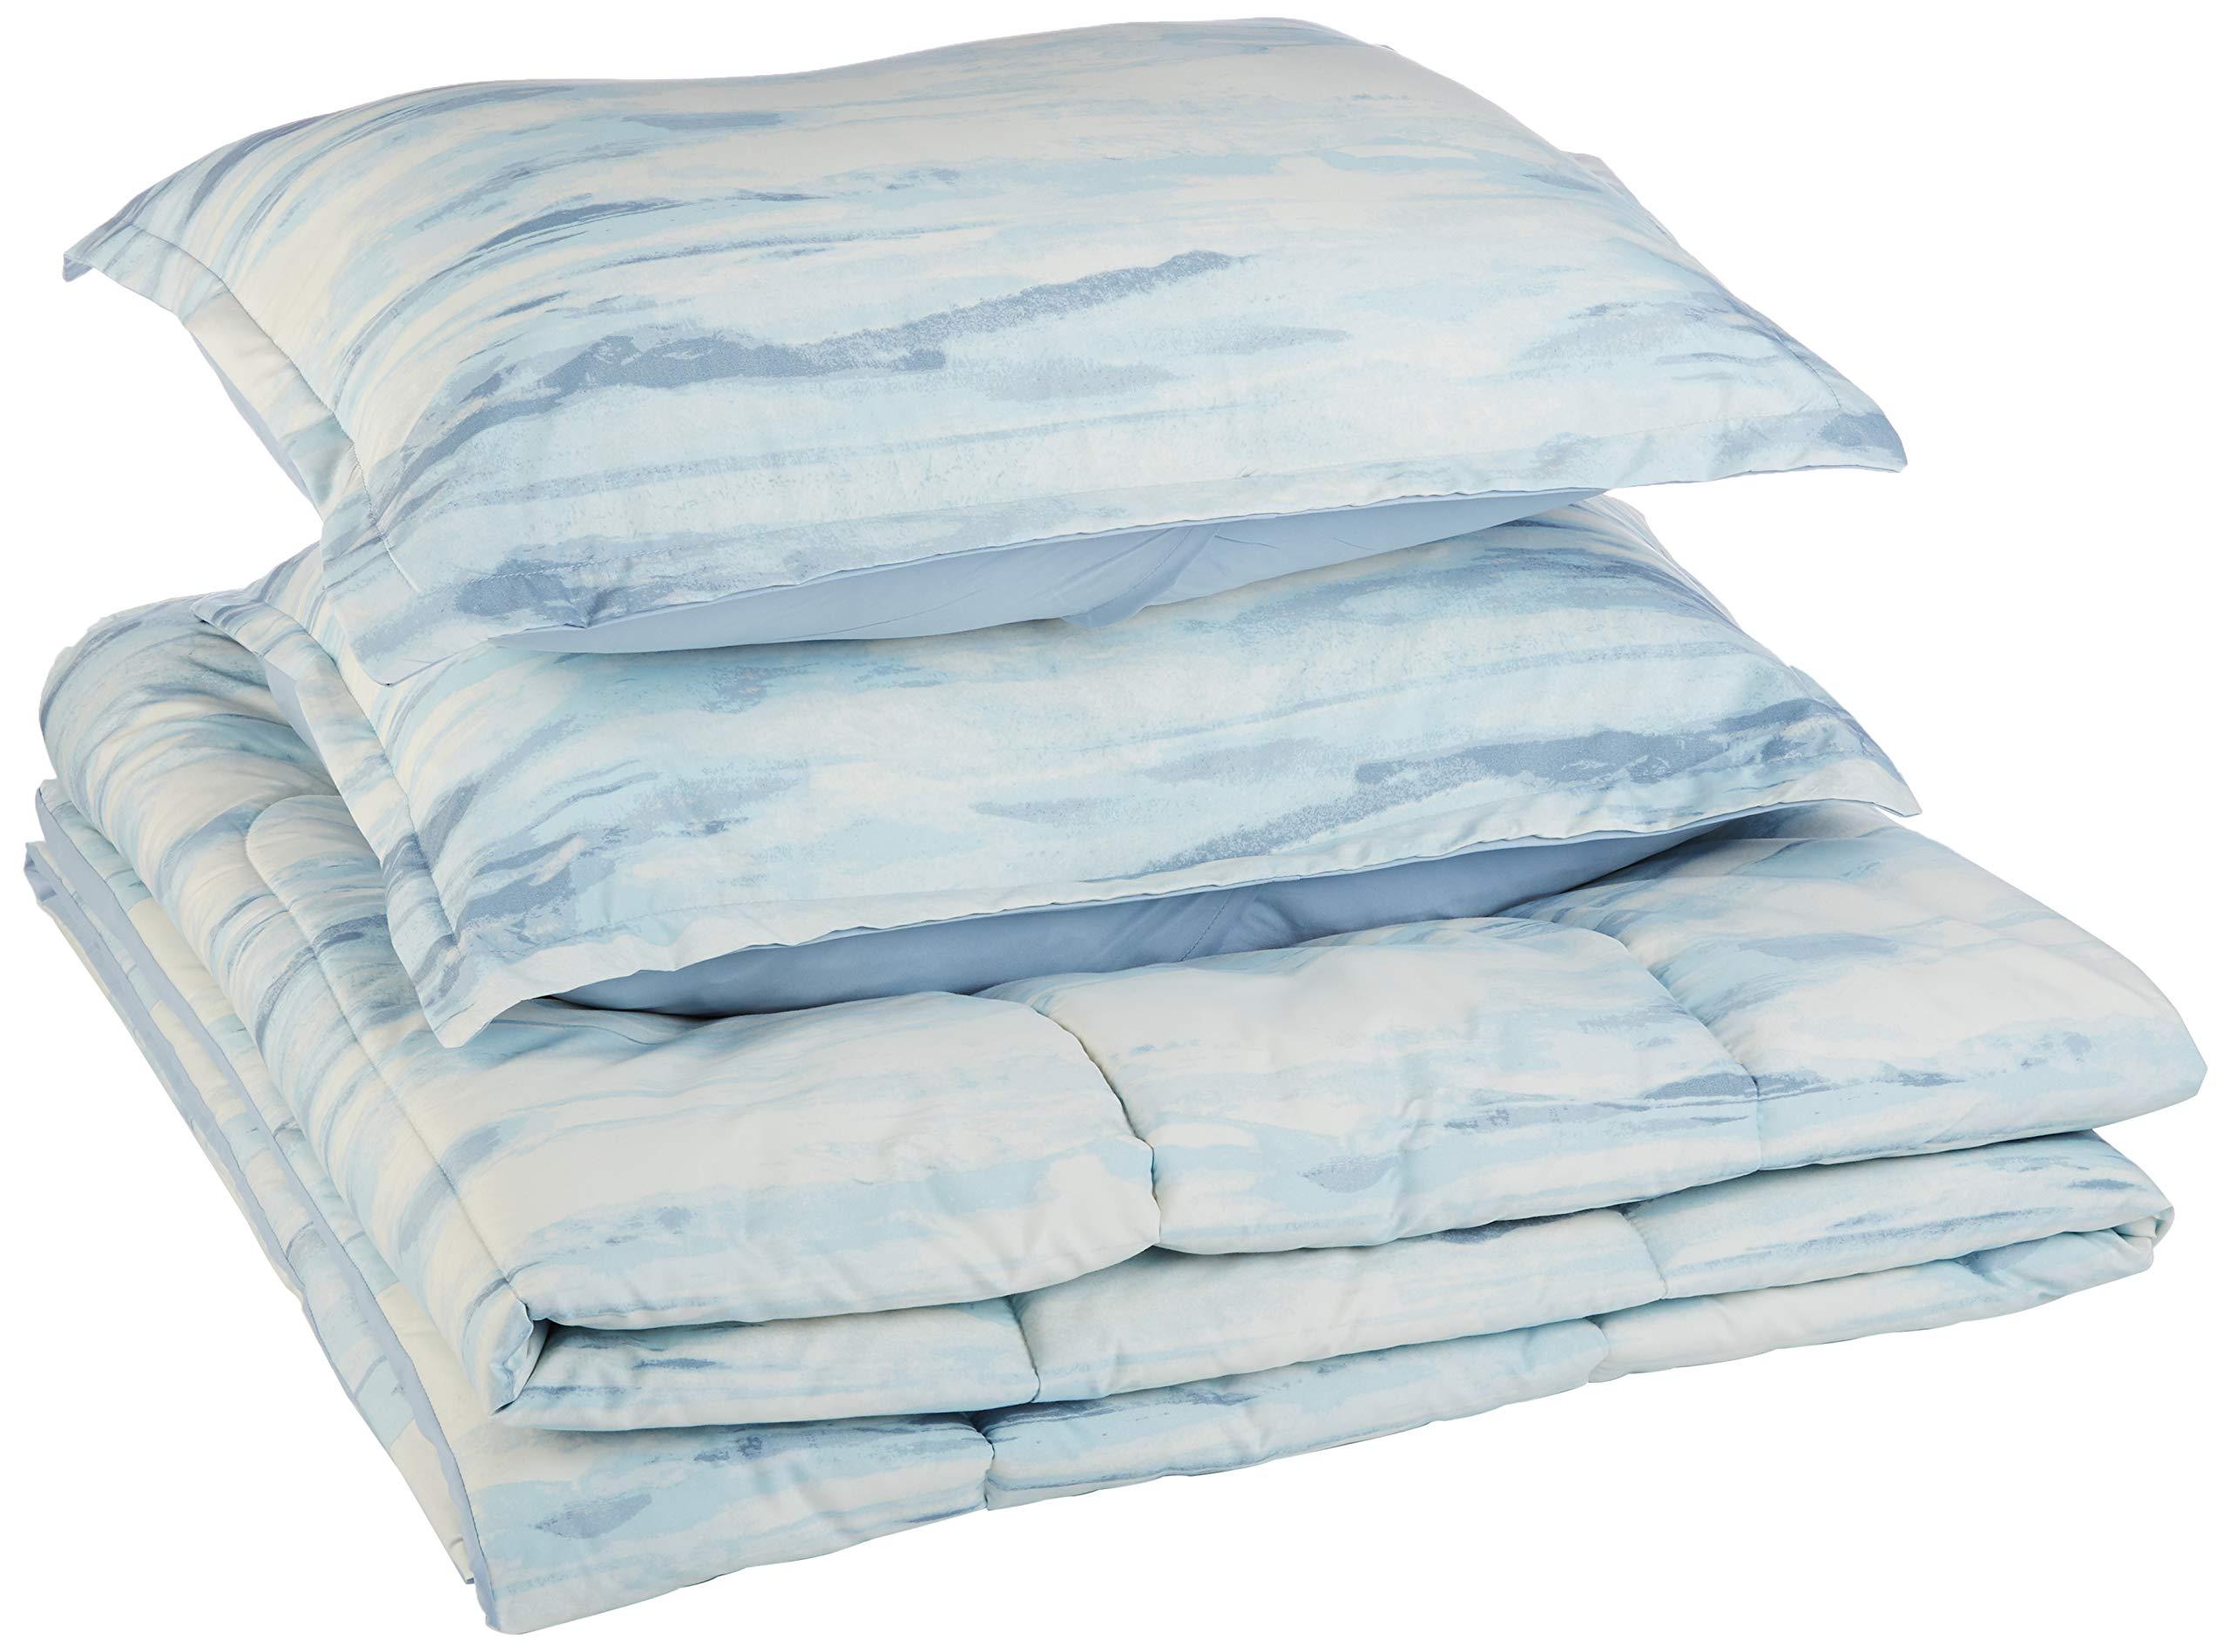 AmazonBasics Comforter Set, Full / Queen, Blue Watercolor, Microfiber, Ultra-Soft